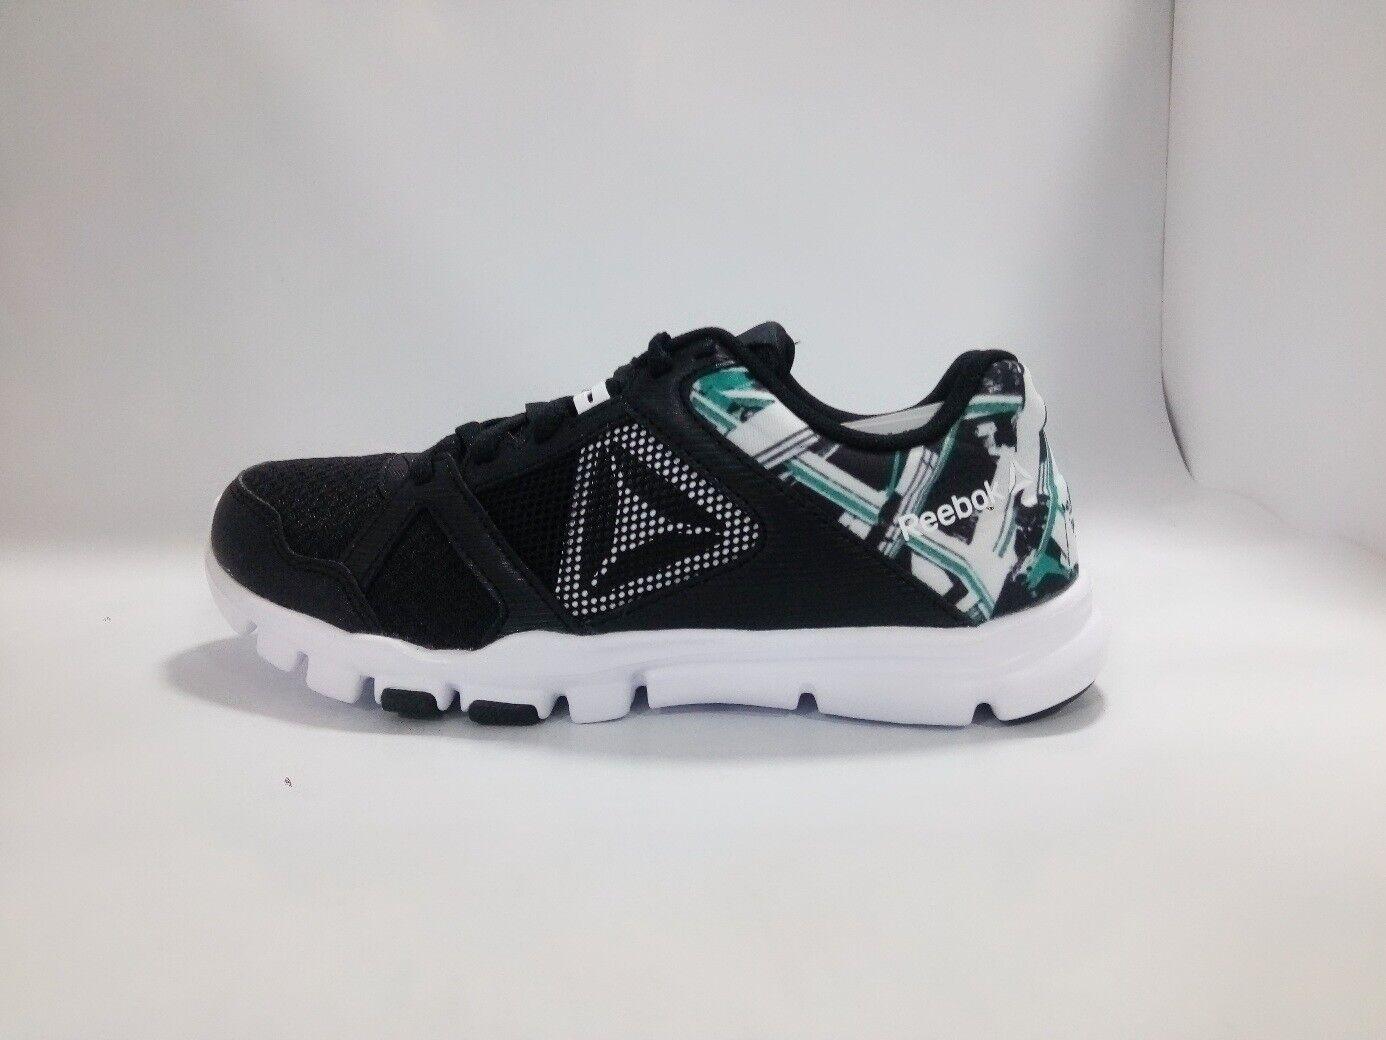 shoes Reebok women - Yourflex Trainette 10 MT - black black black Bianco - CN2766 32ddf3